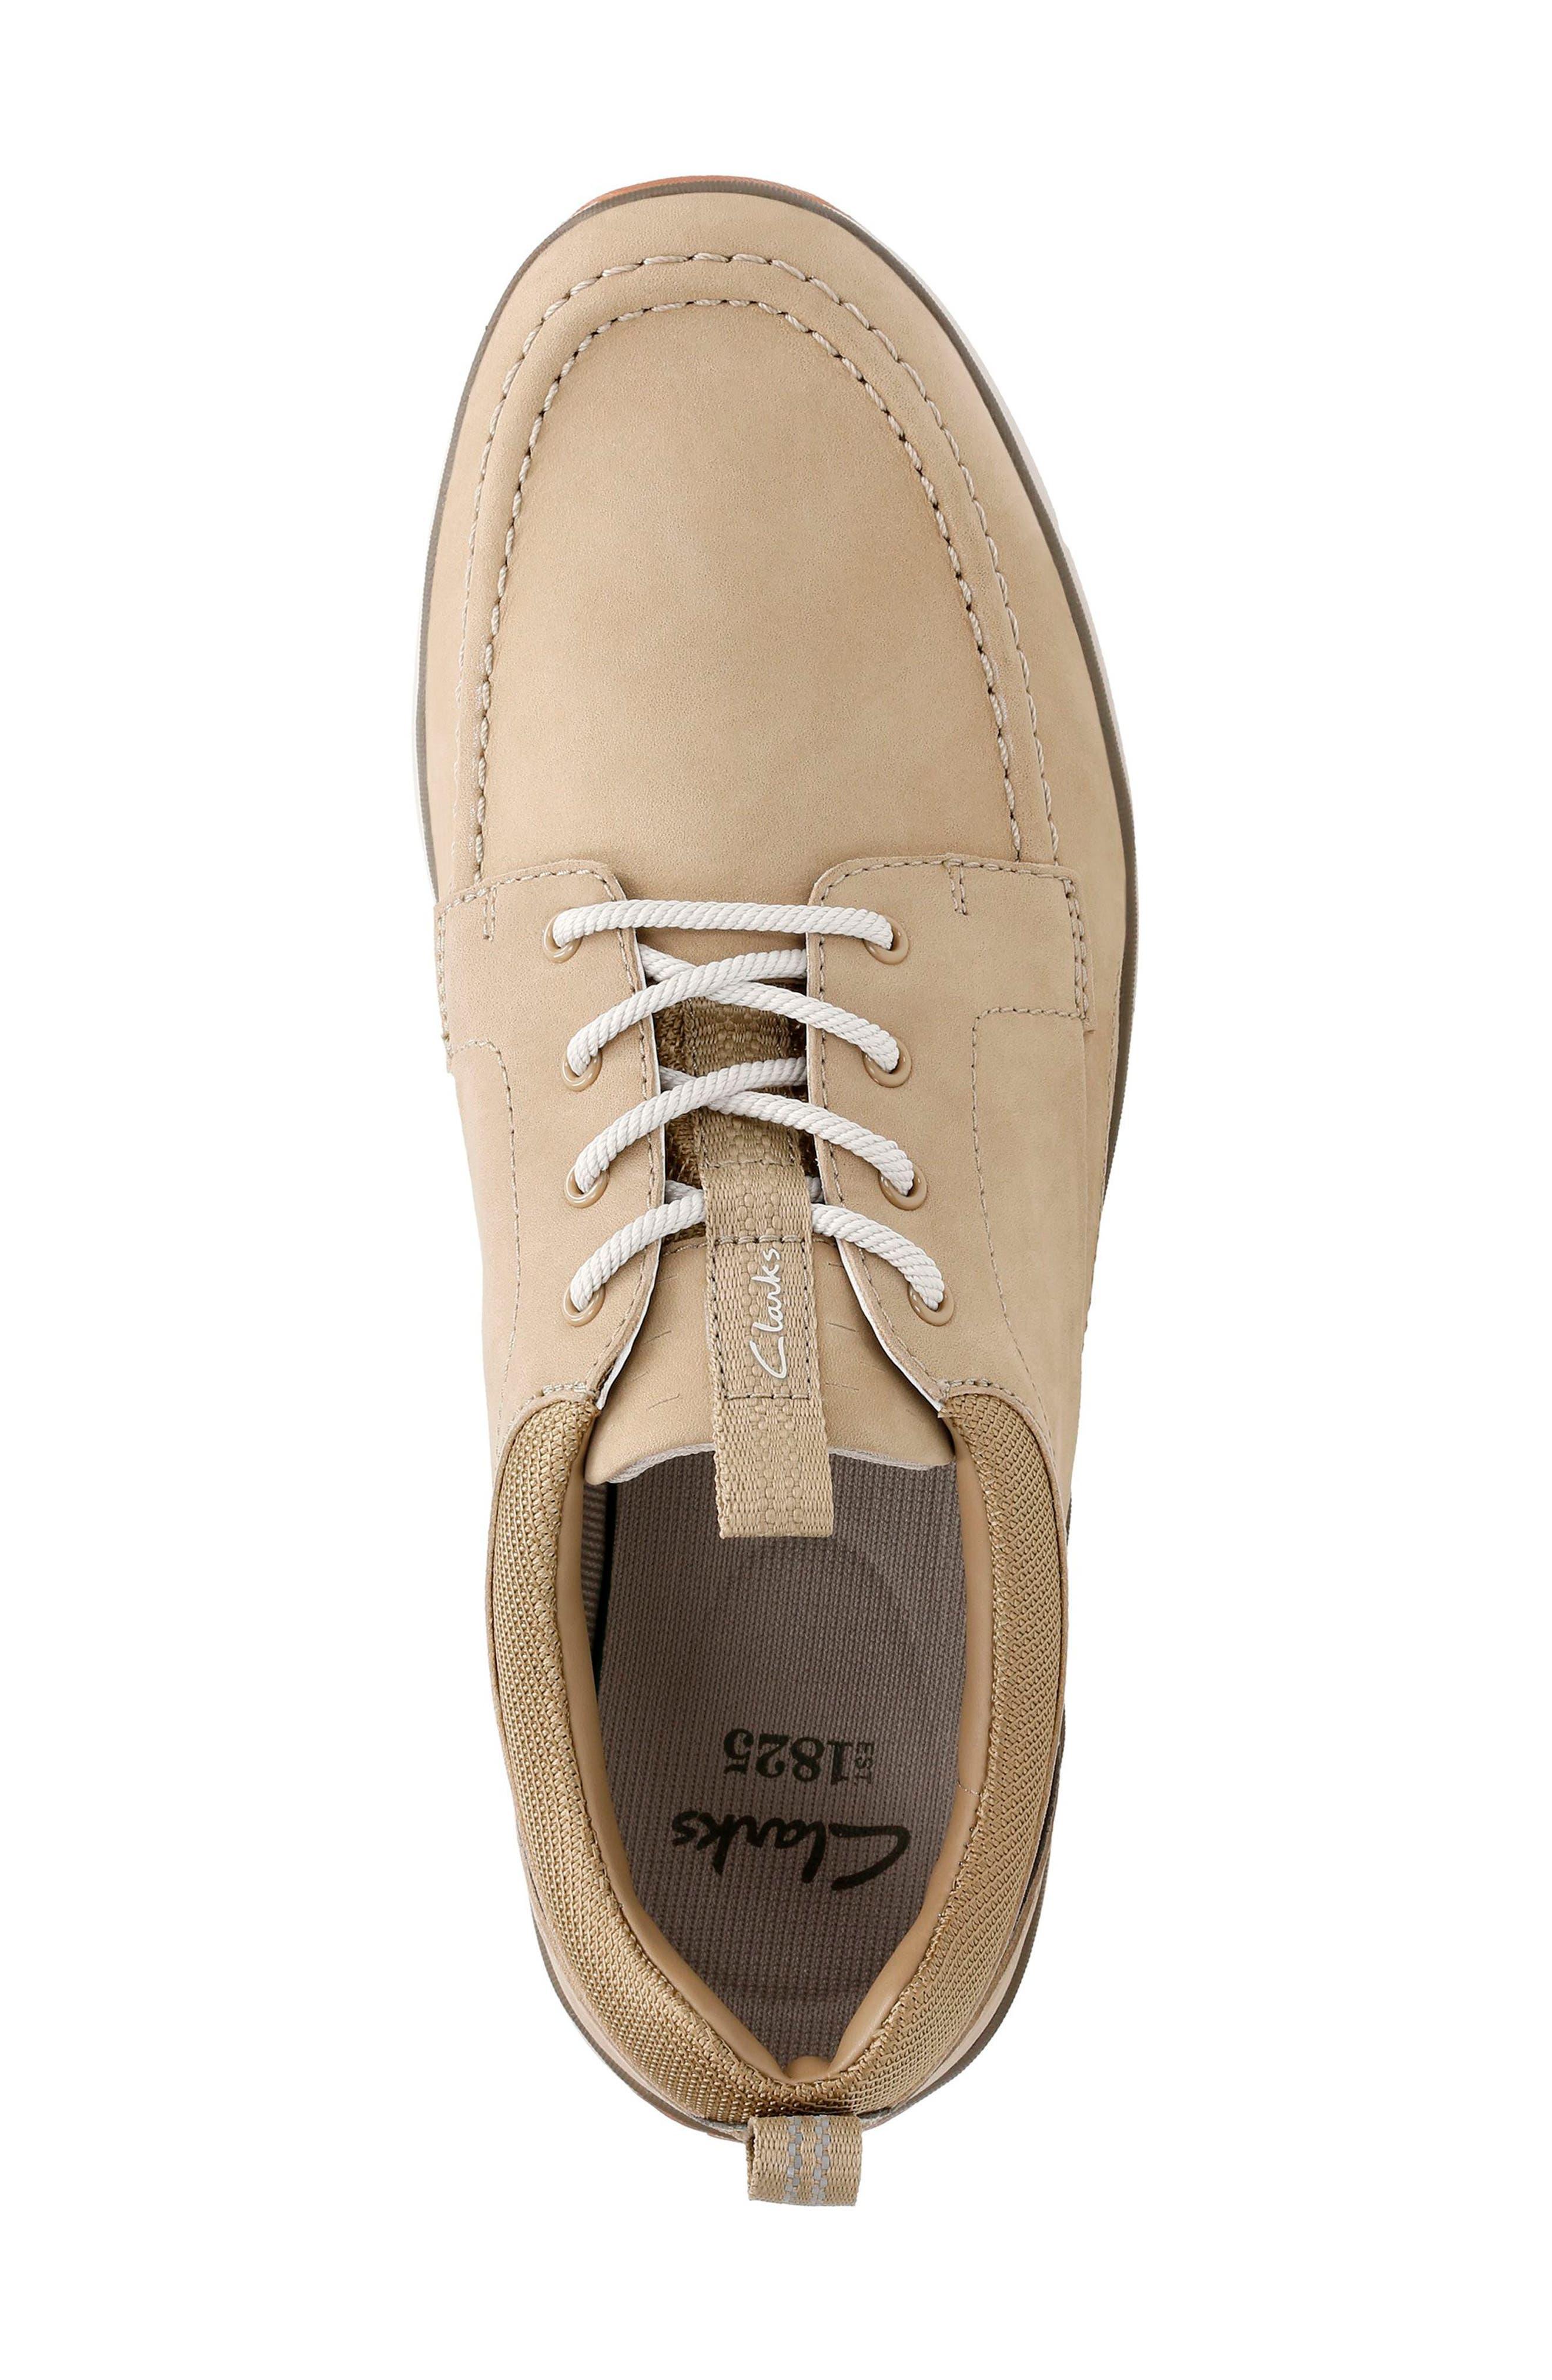 Orson Bay Sneaker,                             Alternate thumbnail 5, color,                             200